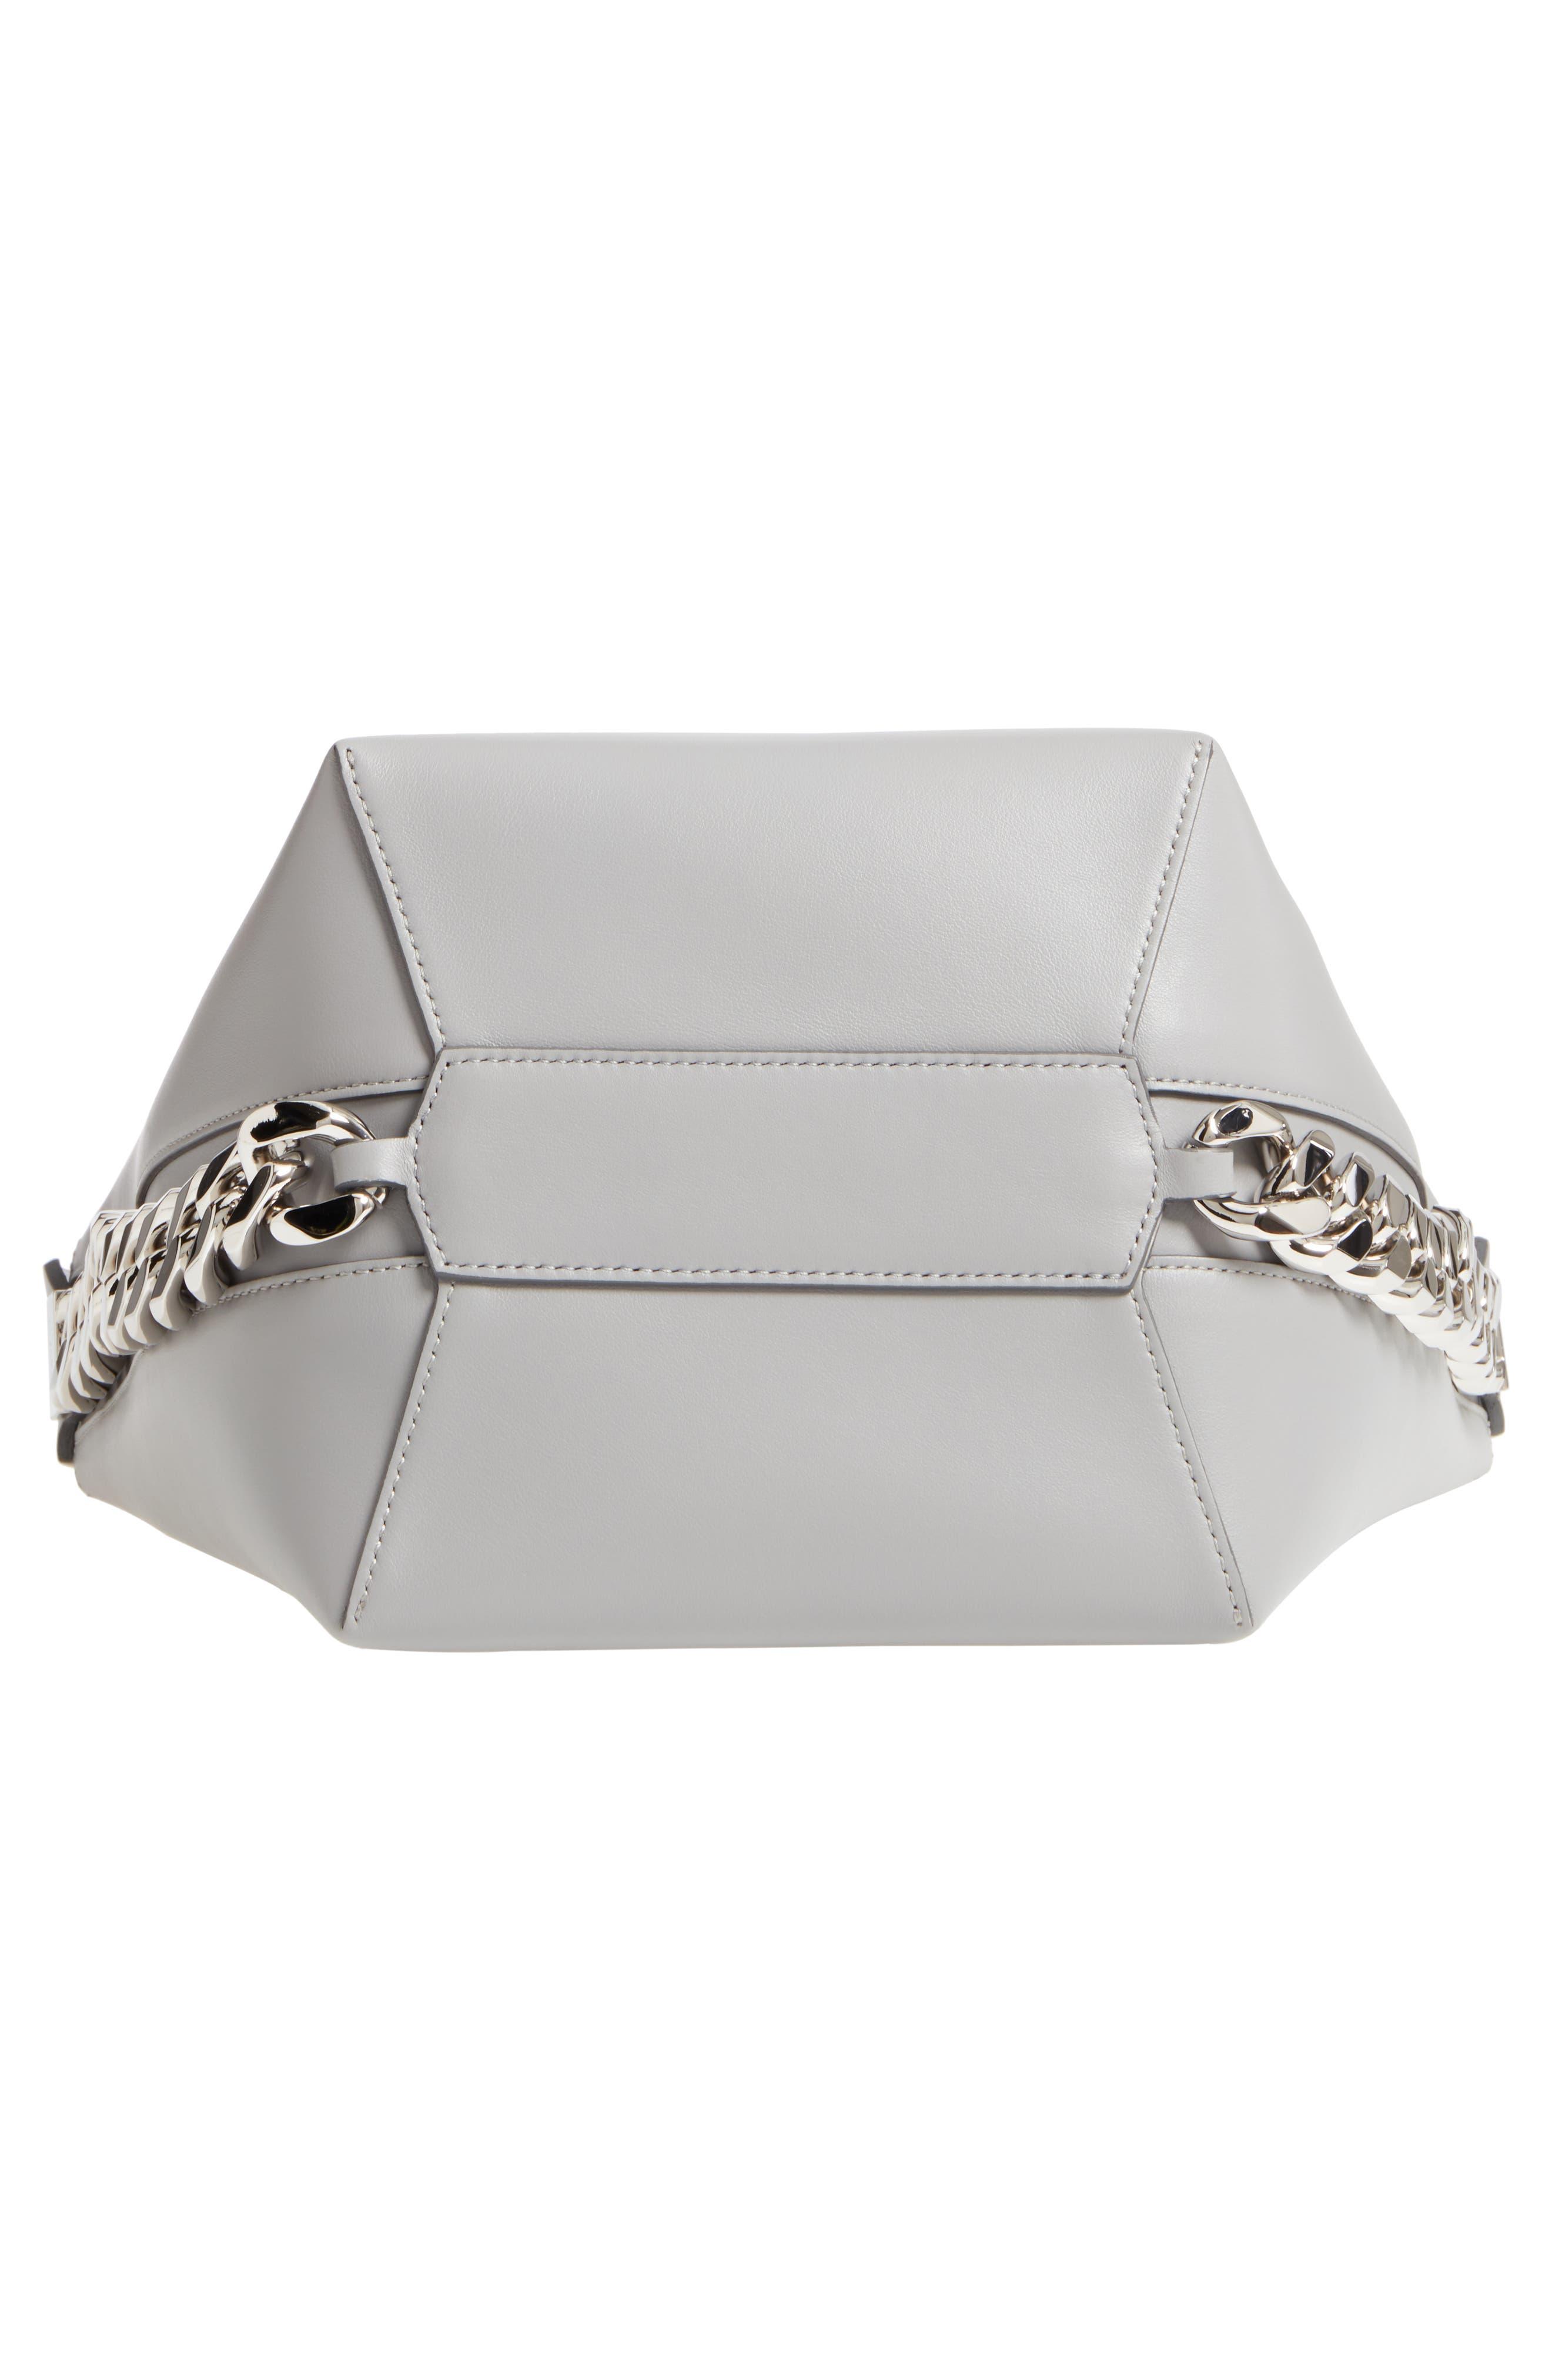 Infinity Calfskin Leather Bucket Bag,                             Alternate thumbnail 6, color,                             051